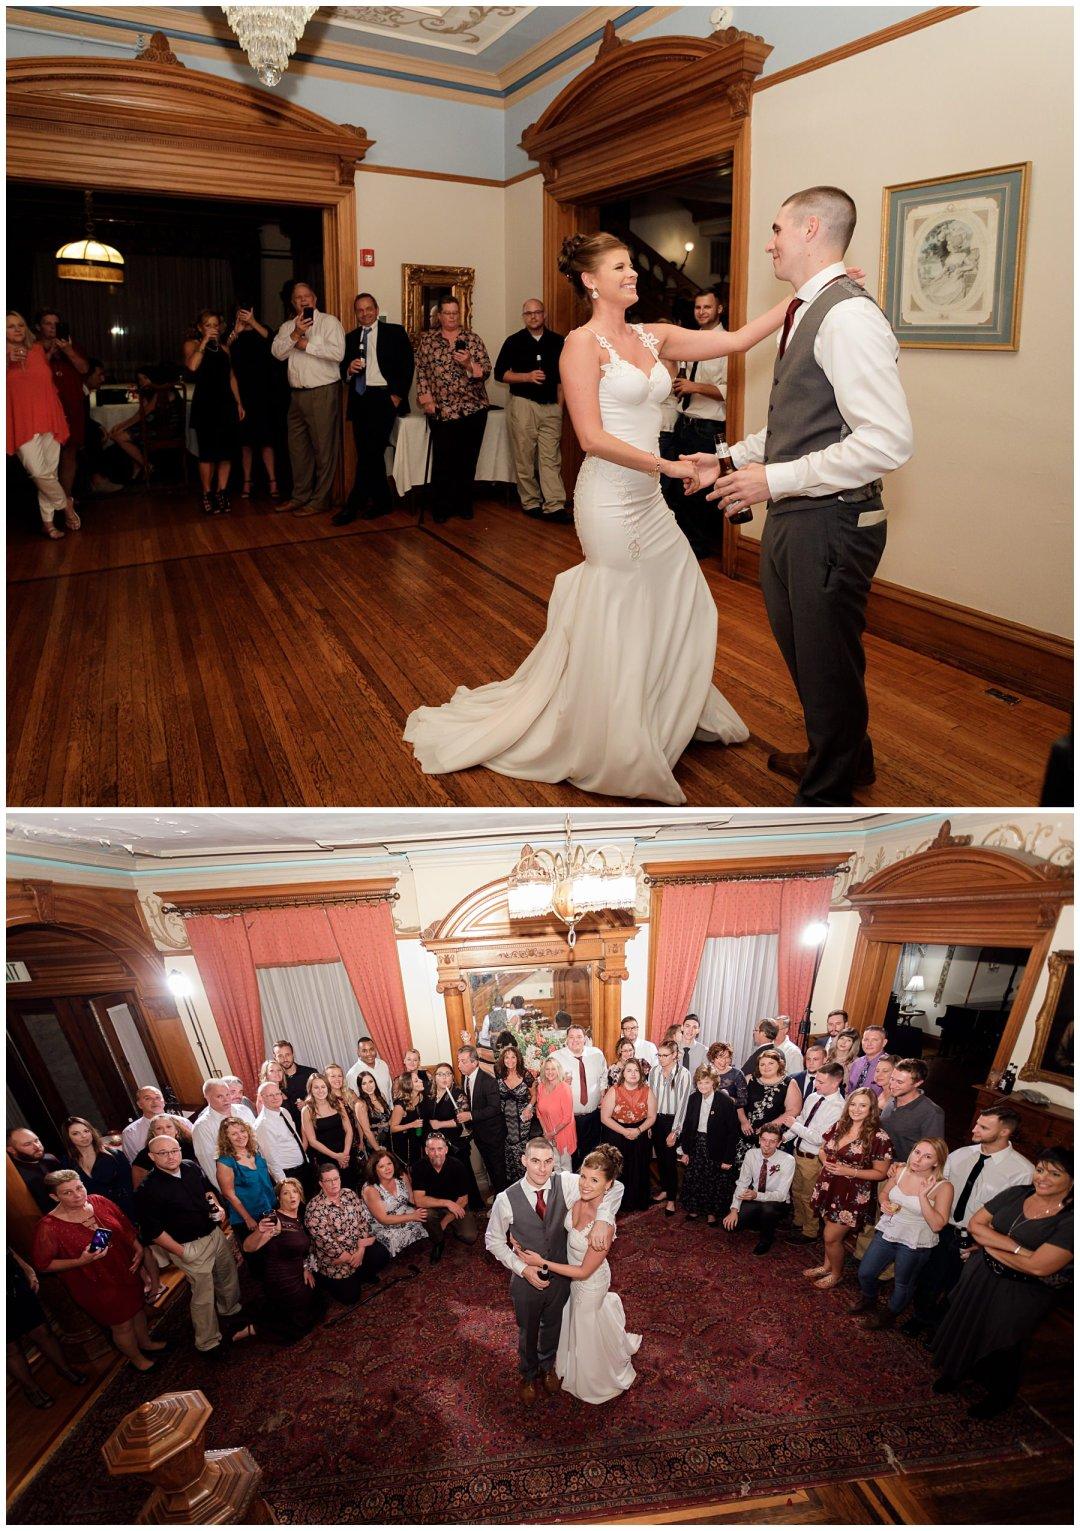 bride and groom dancing the night away